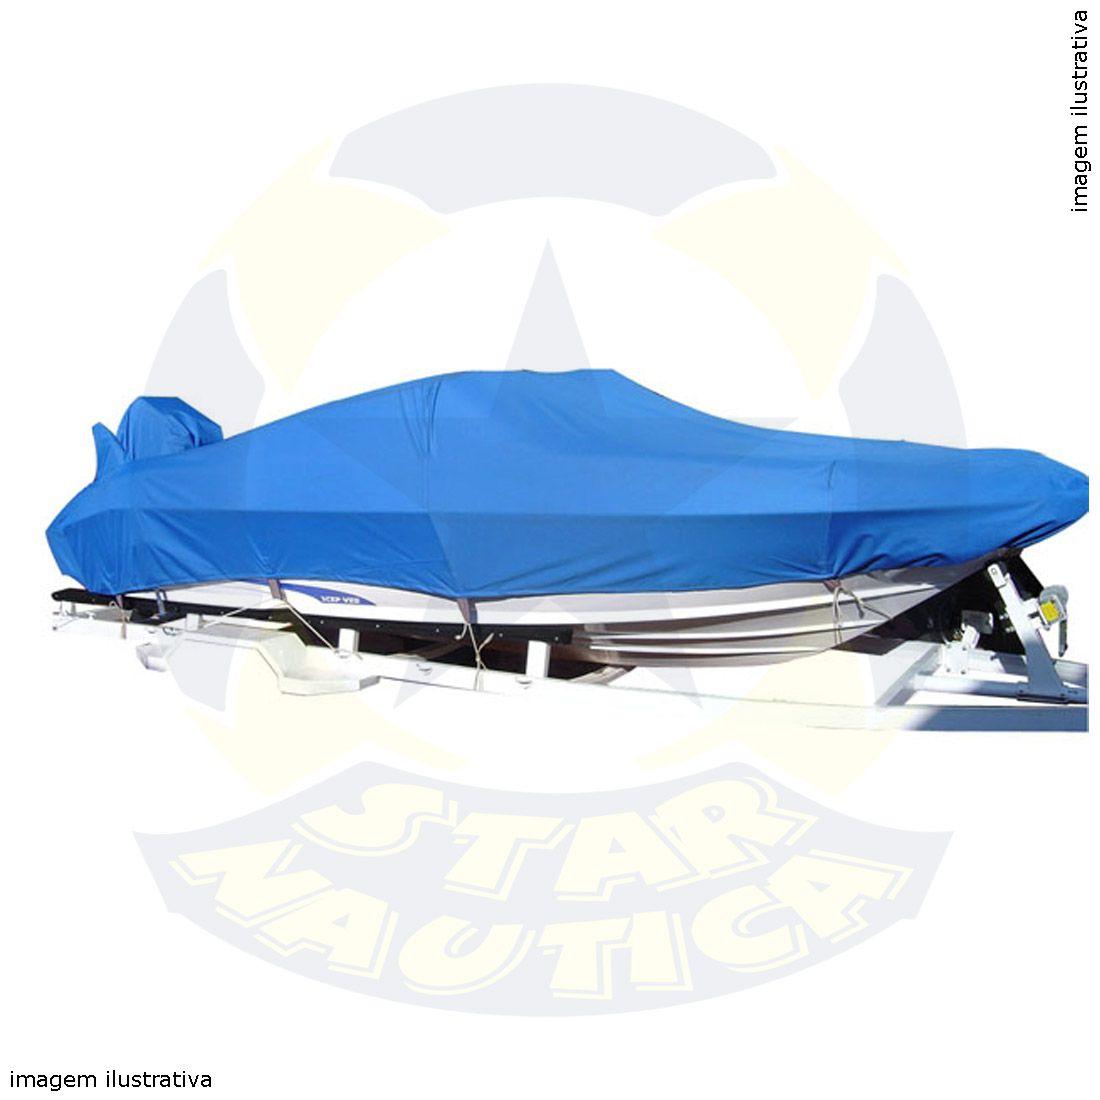 Capa Lona de Cobertura Lancha Focker 215 Lona Poliéster